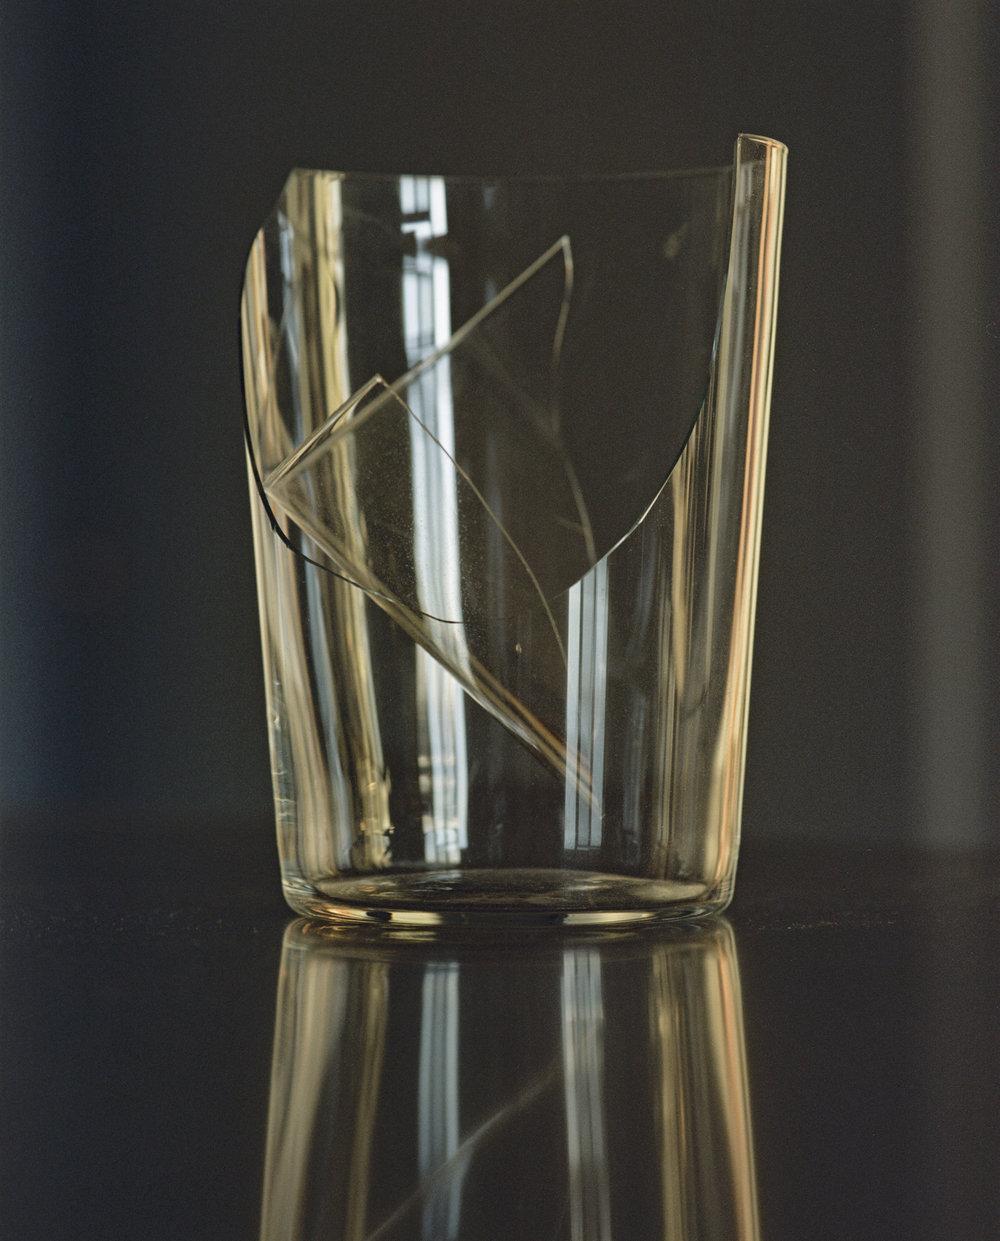 Broken Glass #15